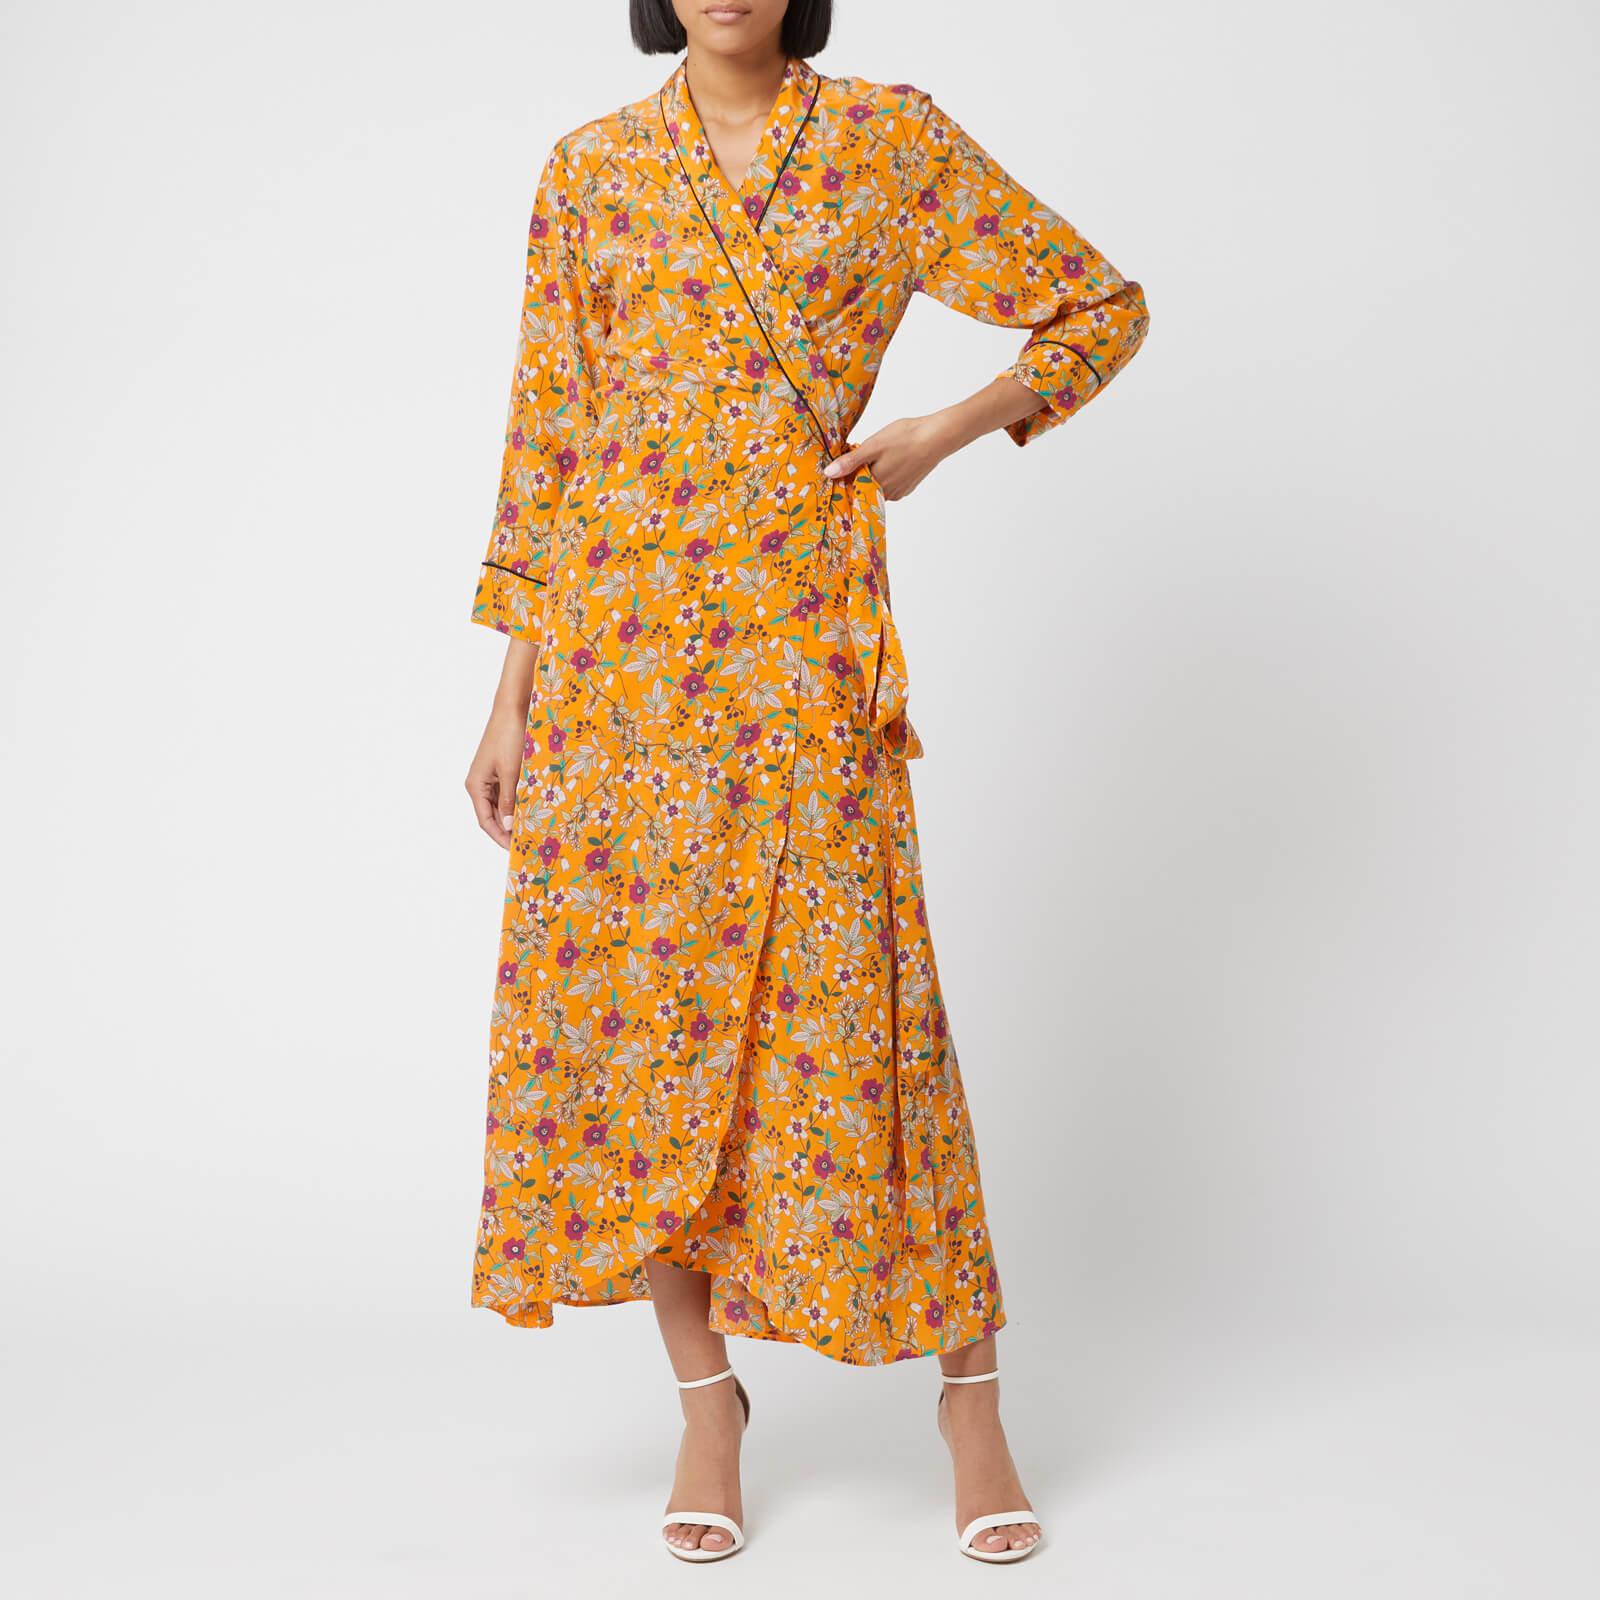 Hugo Boss Women's Kerlina Floral Wrap Dress - Orange Floral - UK 6